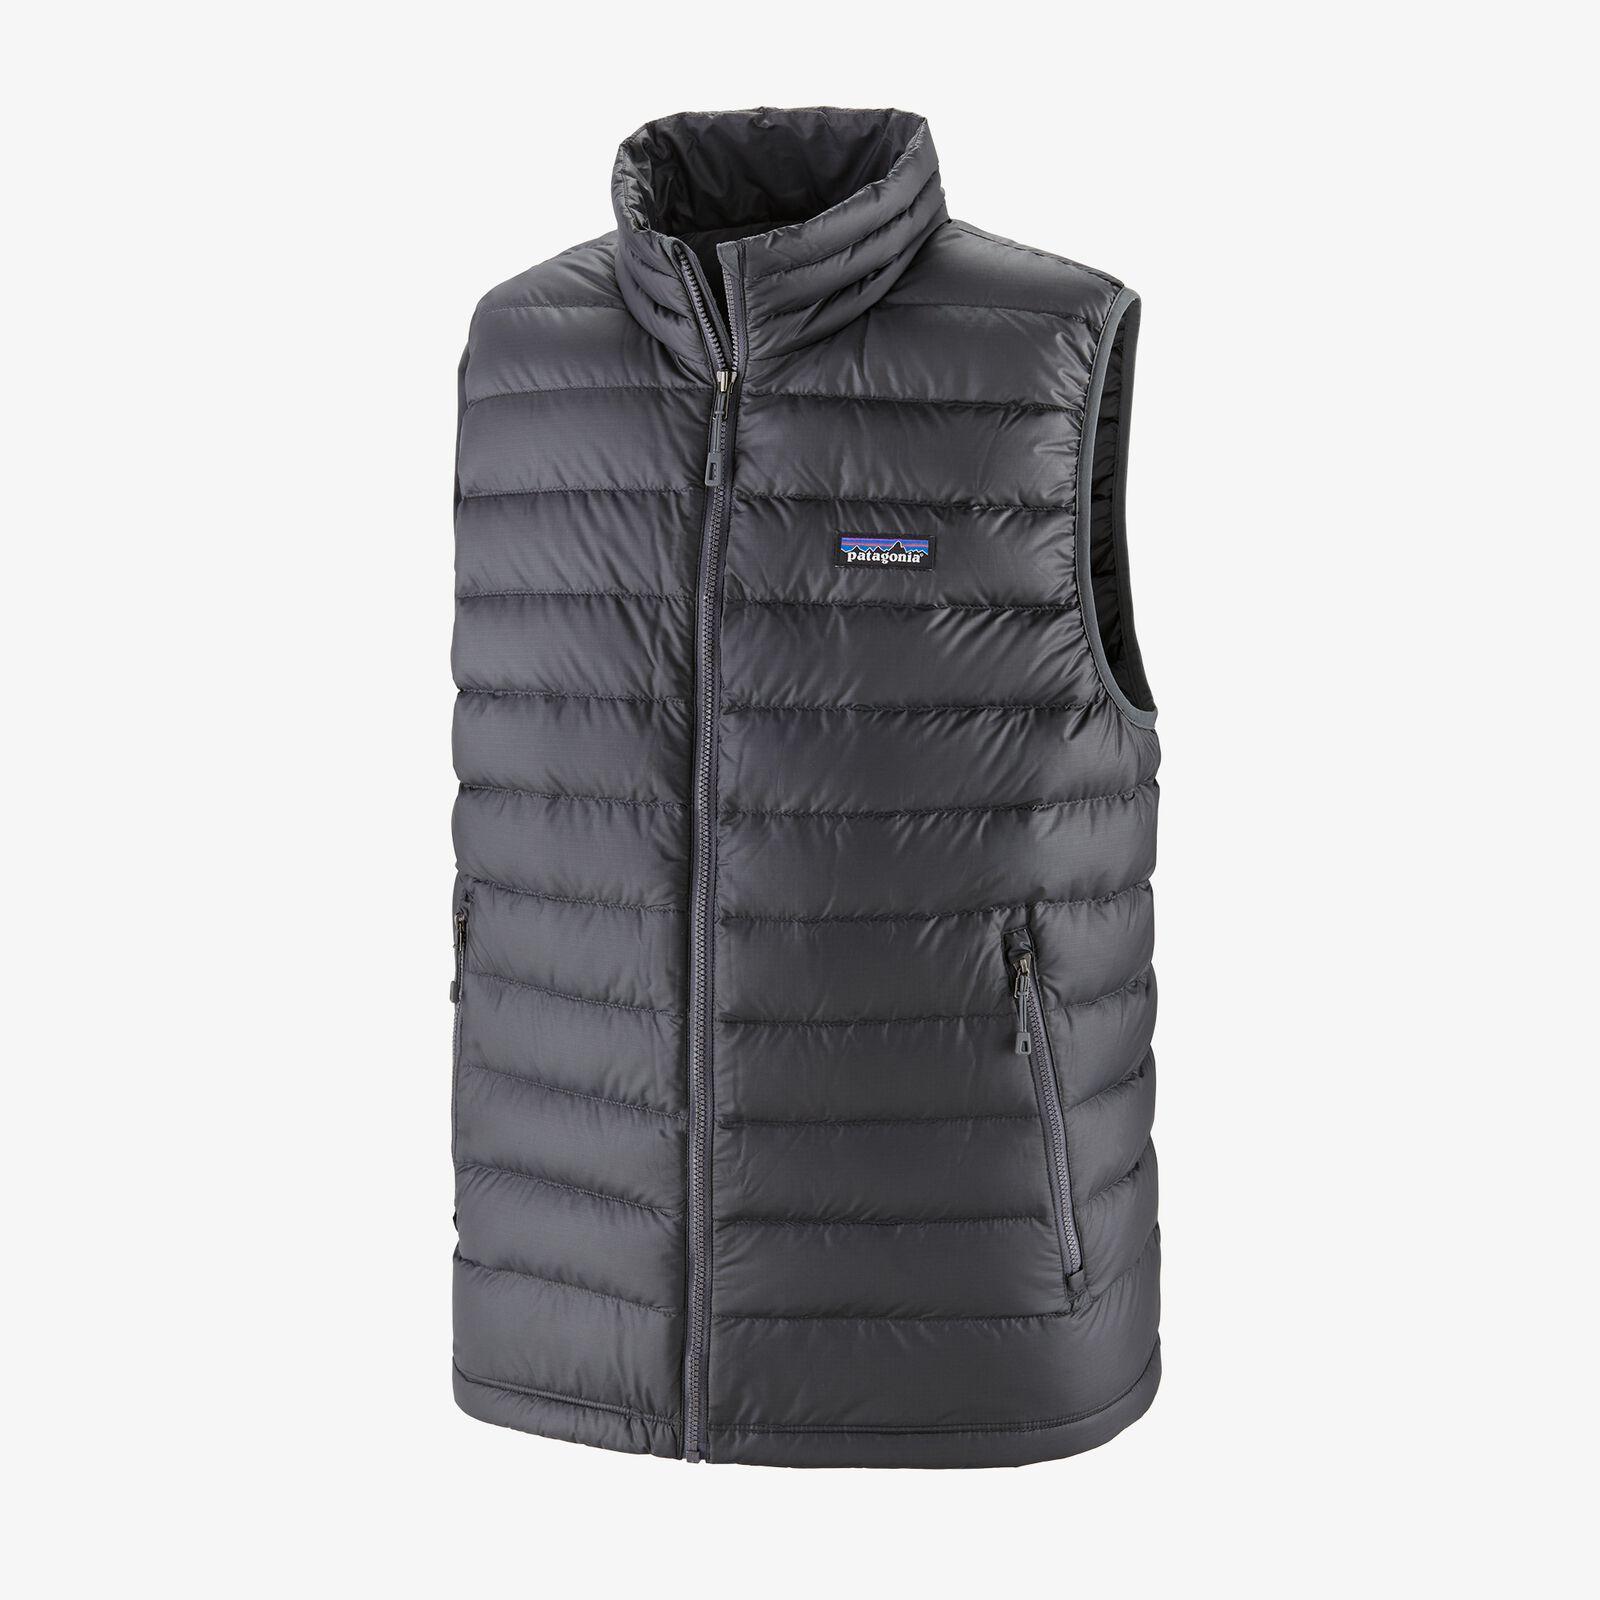 Down sweater jacket or vest zapisek w bruglione investments